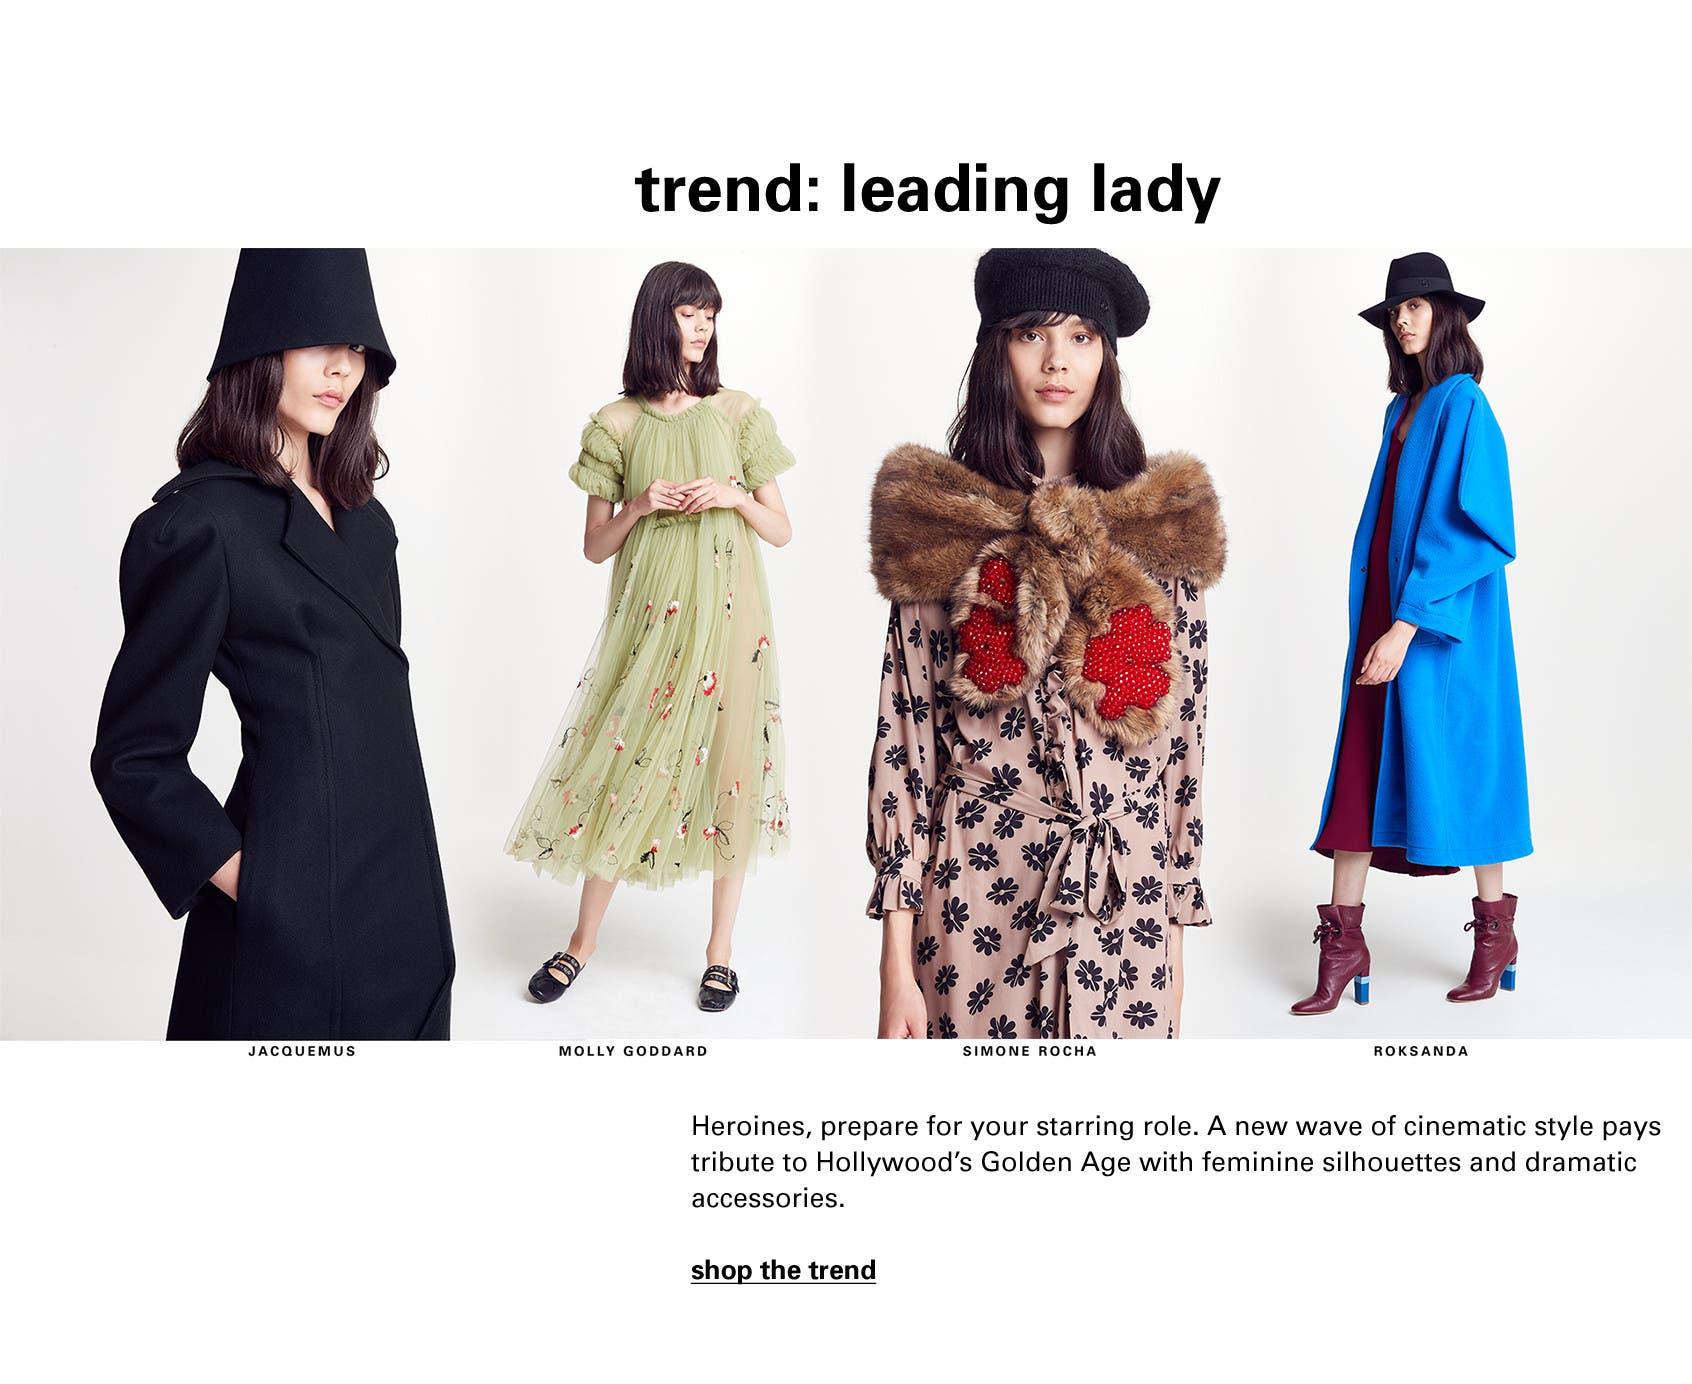 Looks from Jacquemus, Molly Goddard, Simone Rocha and Roksanda.